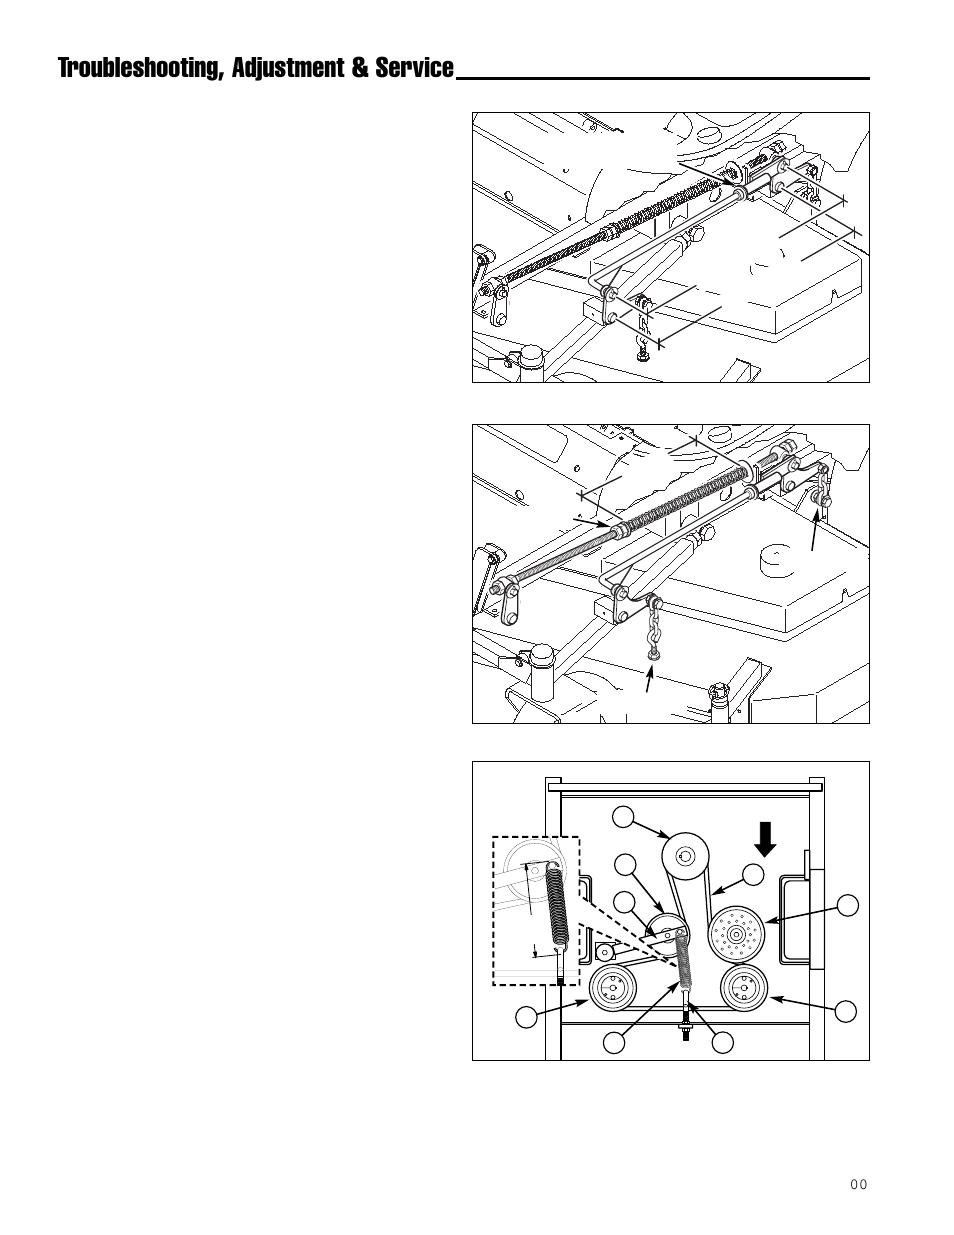 Troubleshooting, adjustment & service, Hydraulic pump drive belt